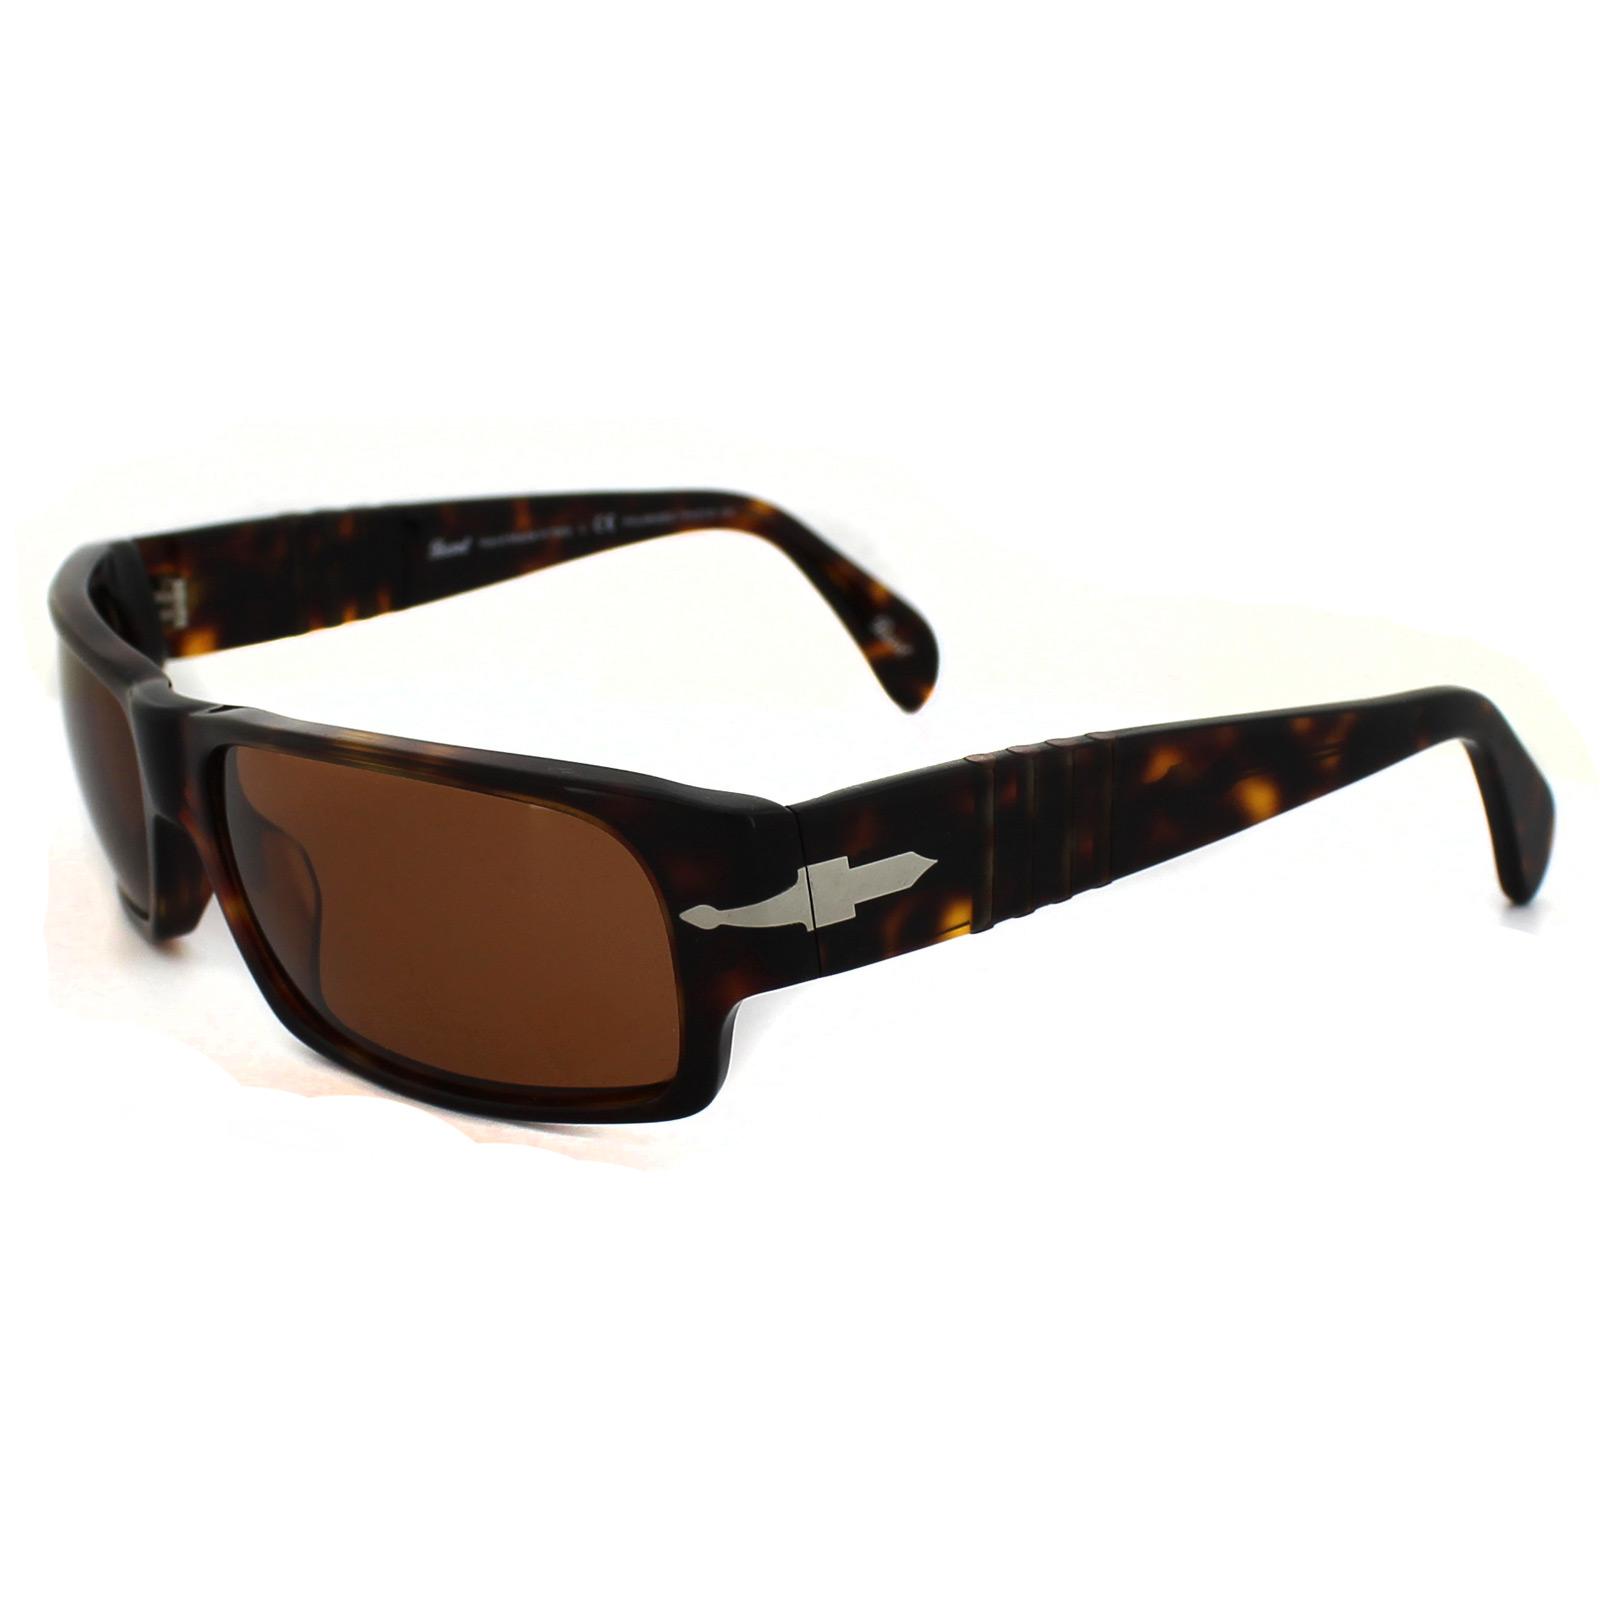 cost of oakley sunglasses 9kfk  cost of oakley sunglasses